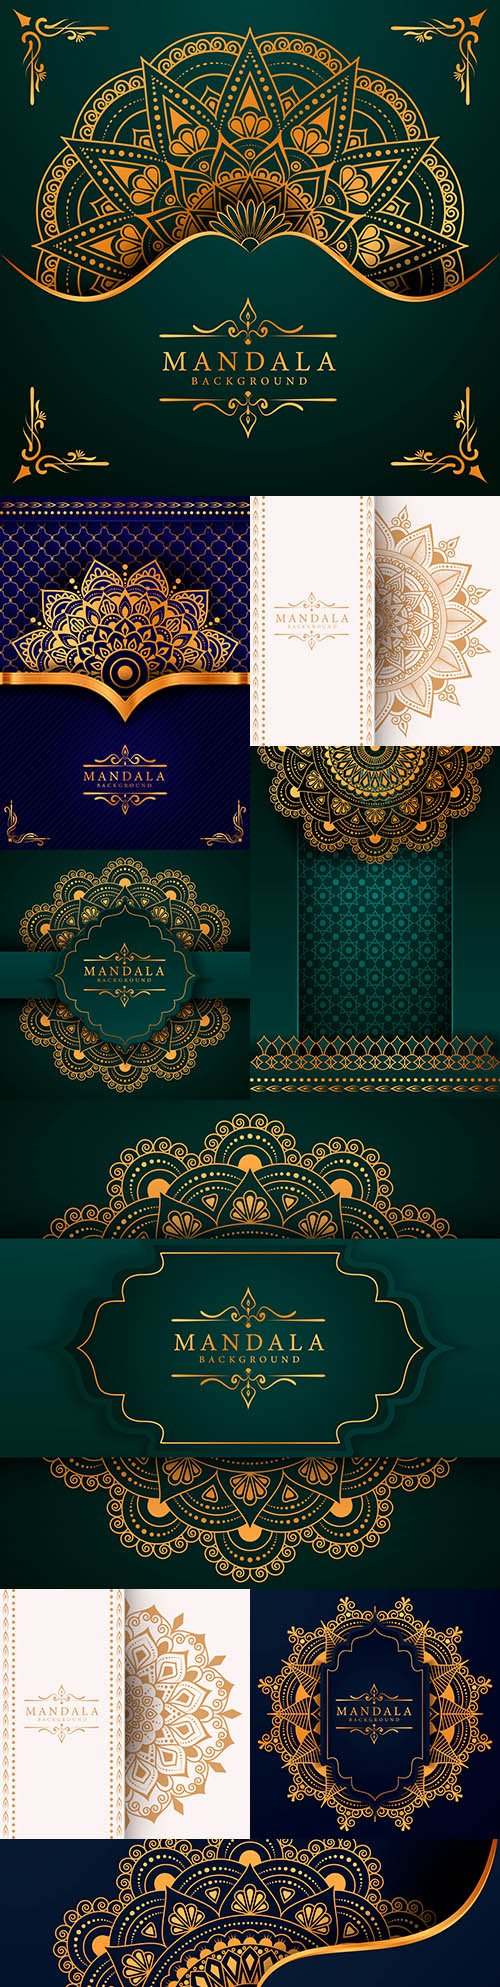 Mandala creative luxury blue and green design background 5